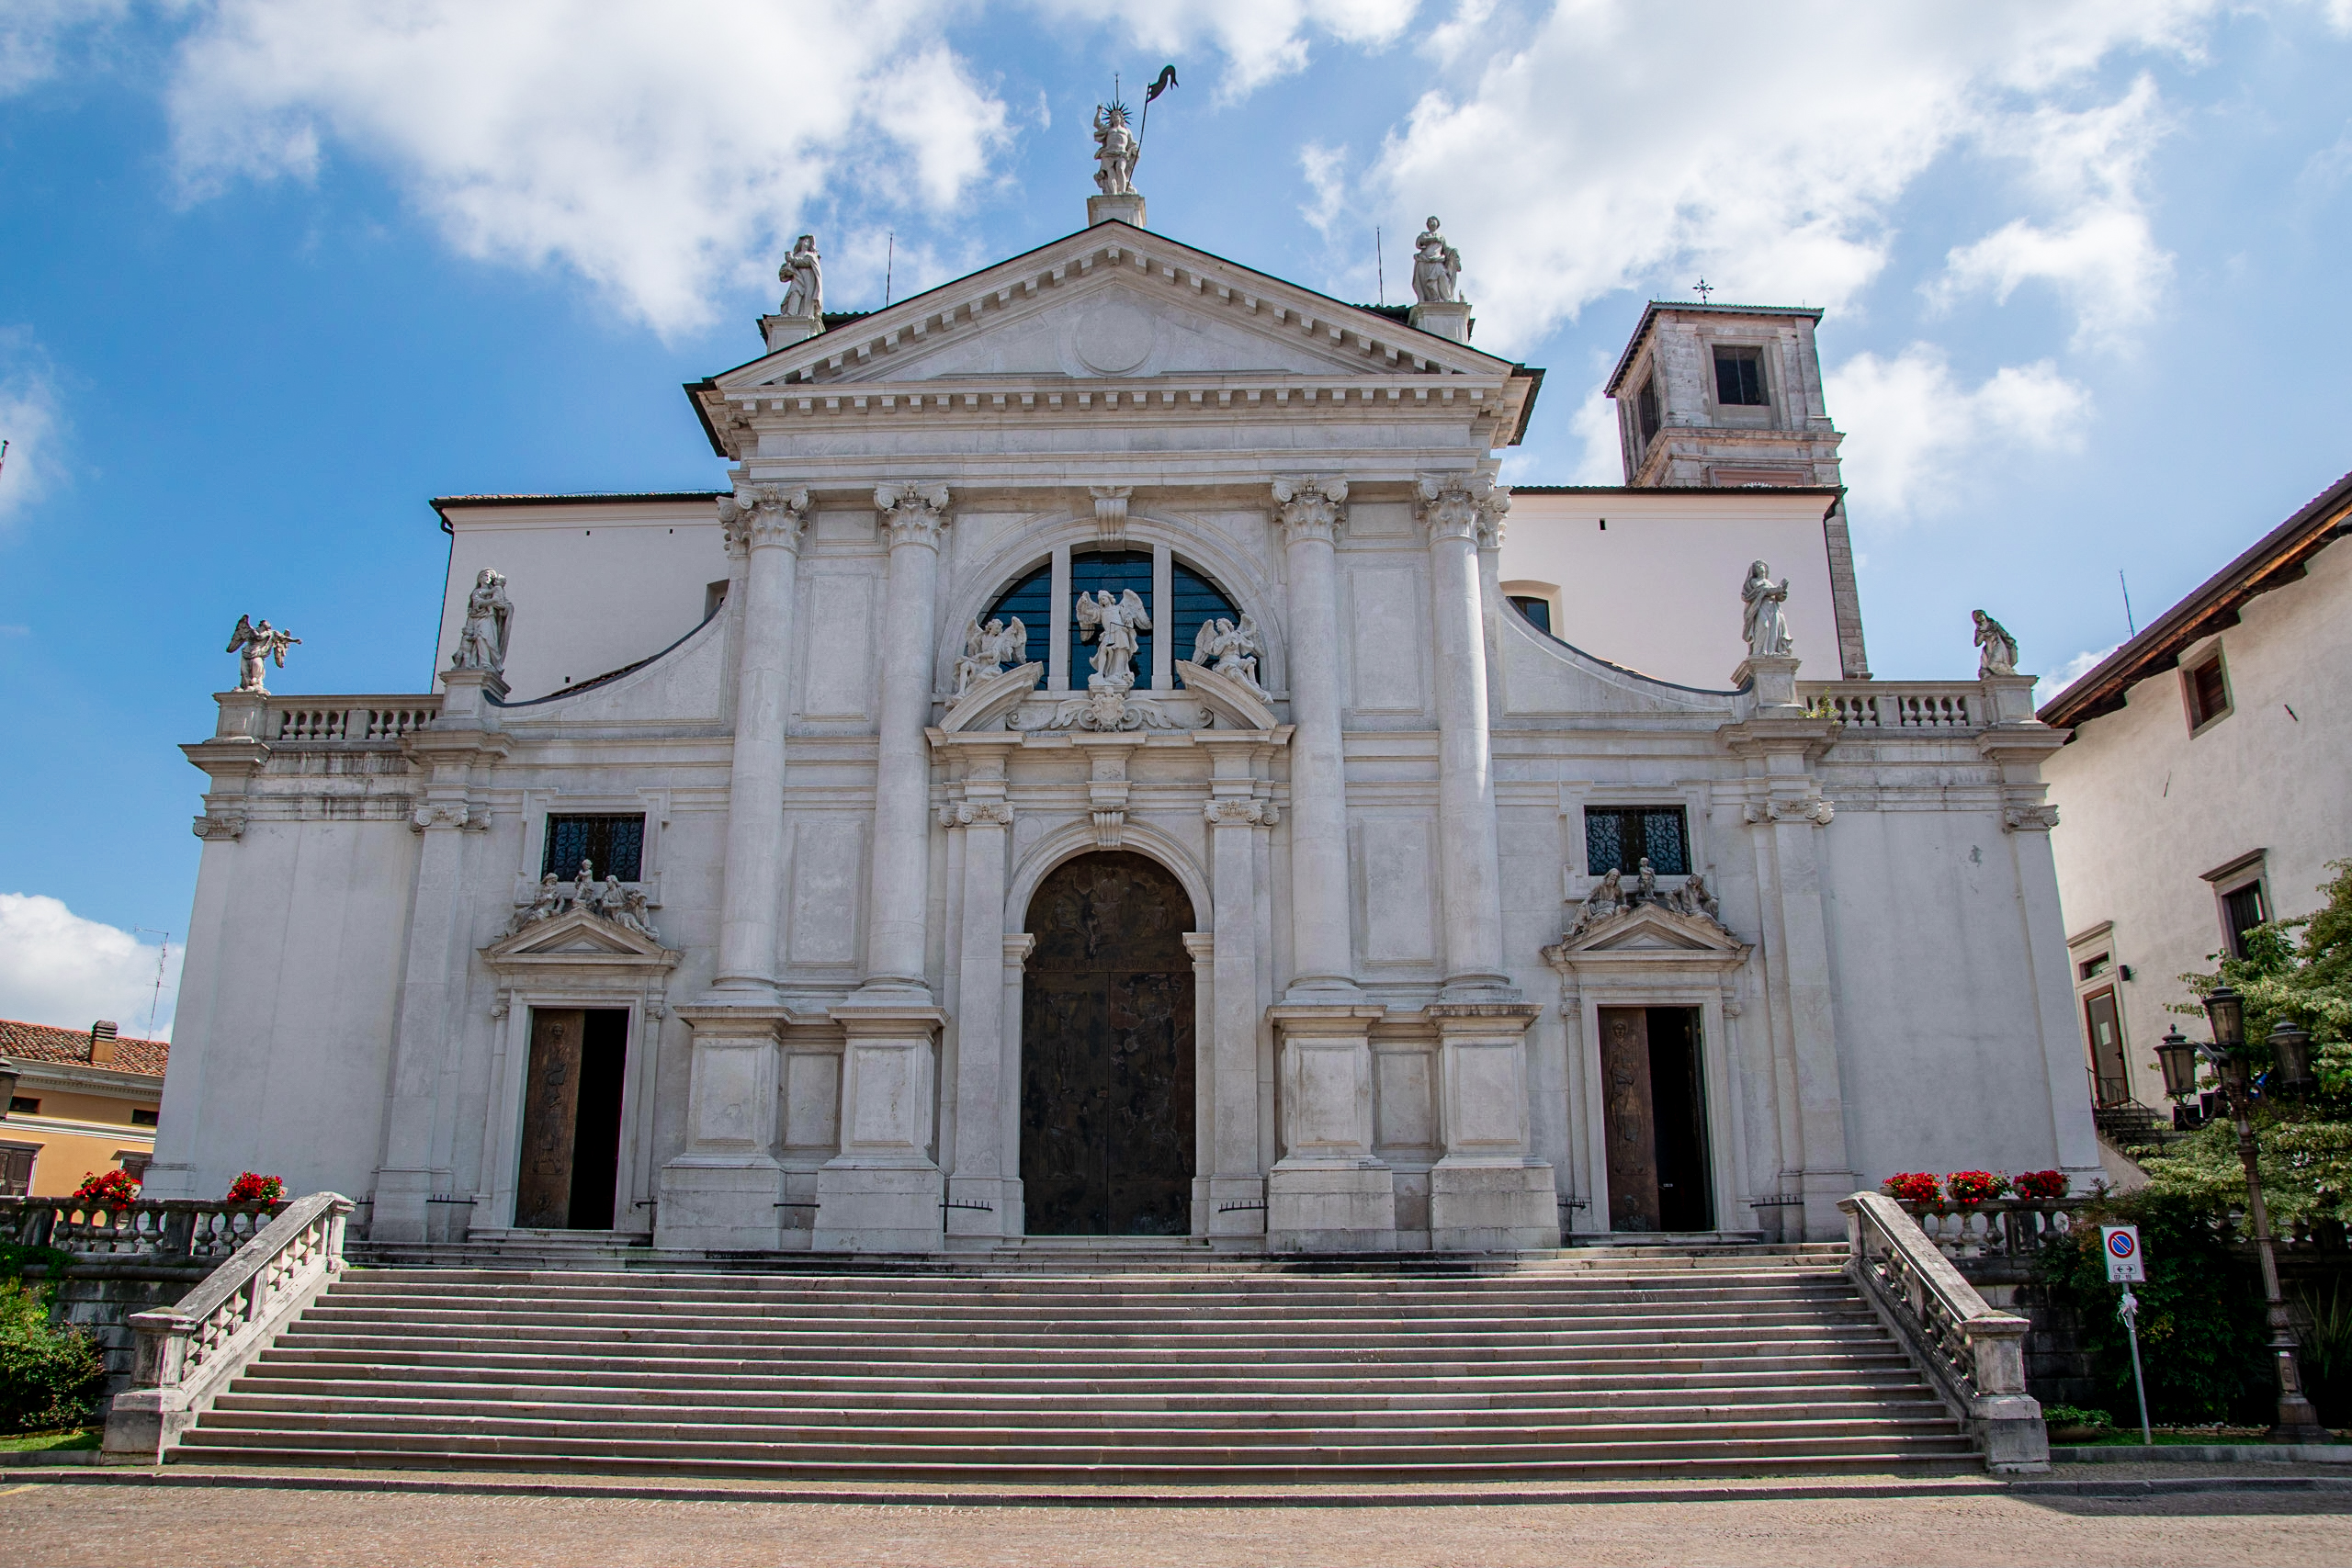 Duomo di San Michele Arcangelo - San Daniele del Friuli